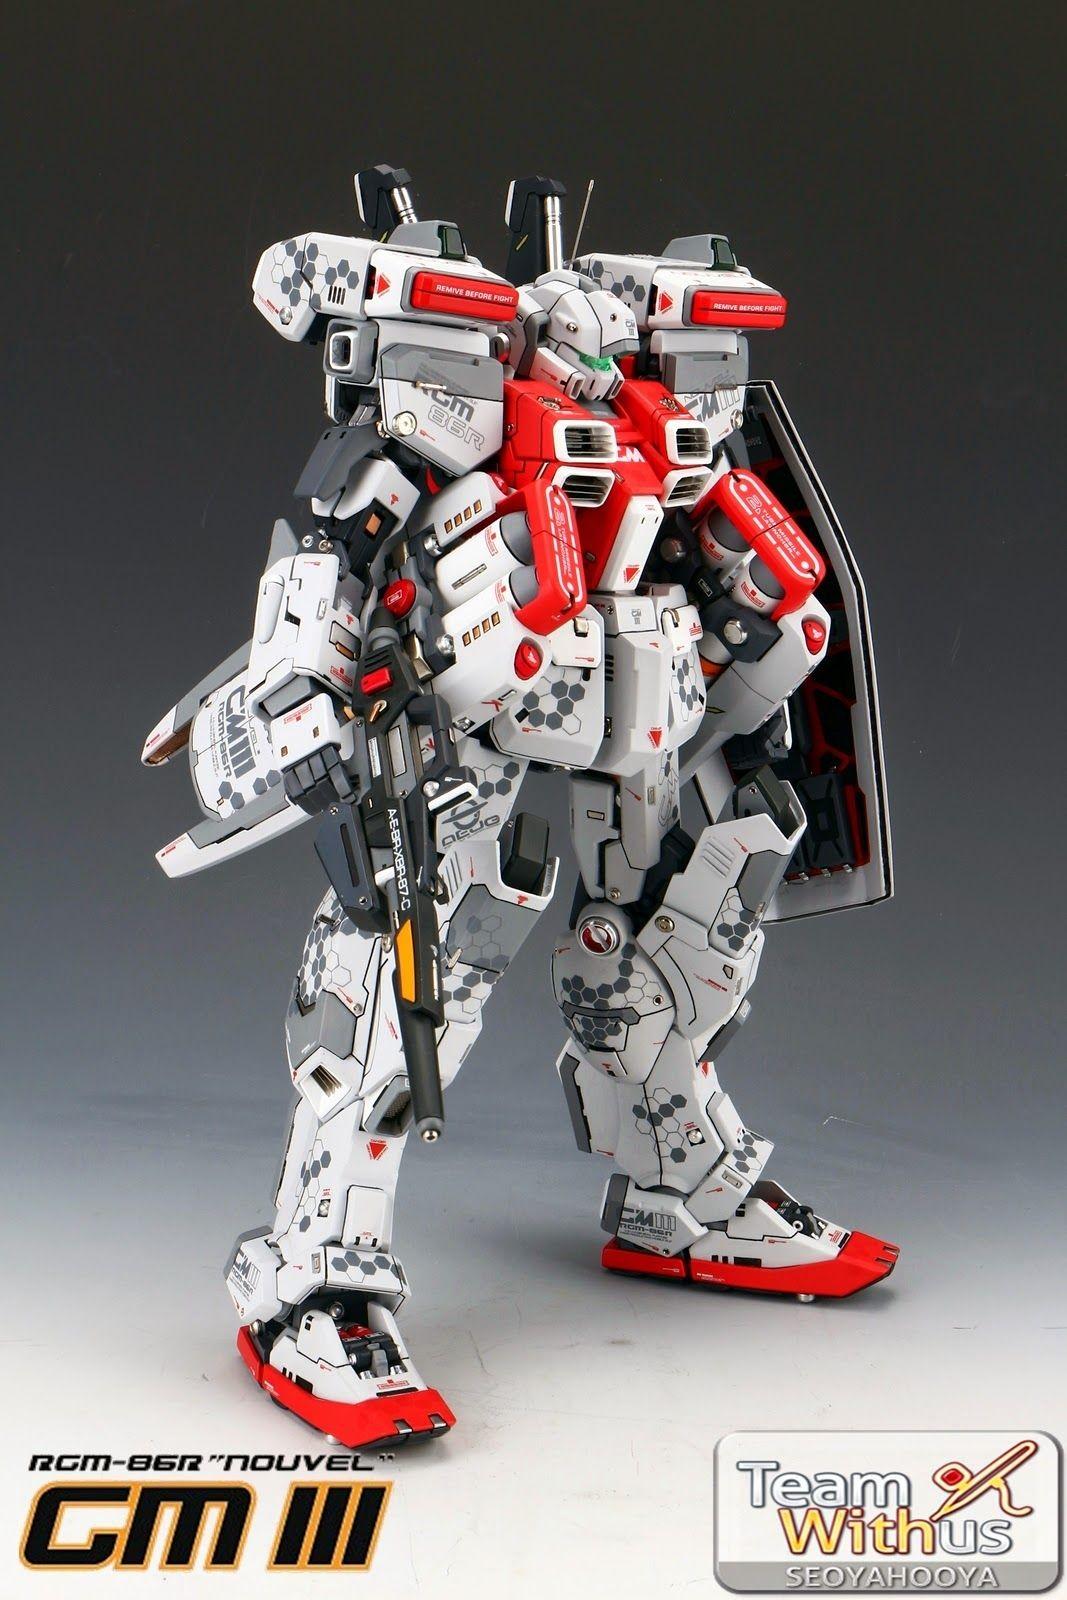 Papercraft Gundam Gundam Guy 1 72 Rgm 86r Gm Iii Nouvel Painted Build